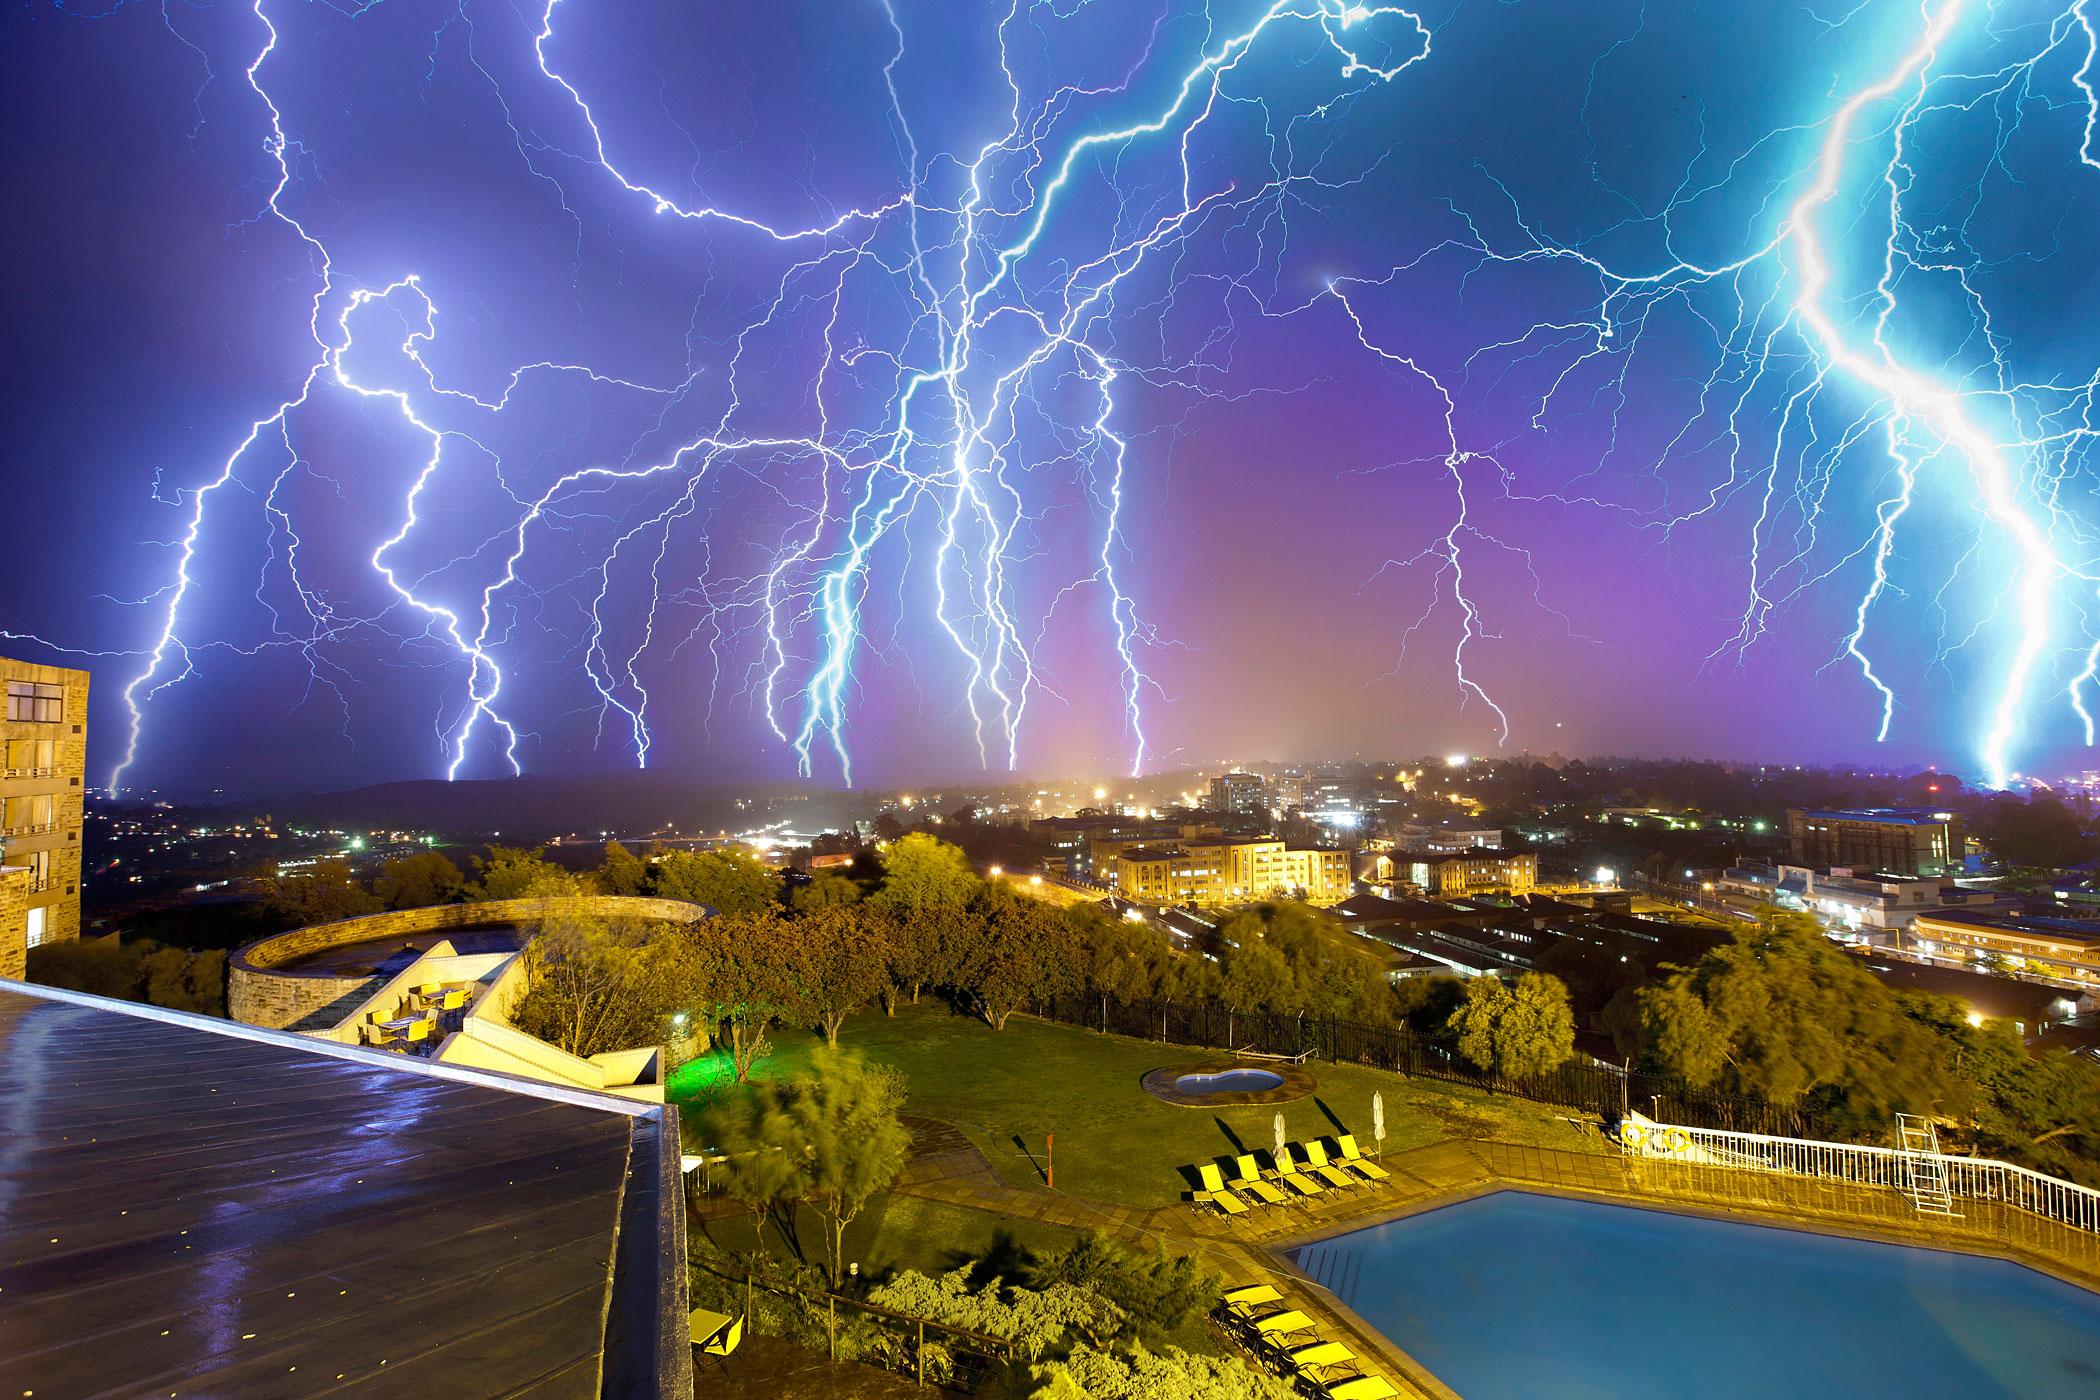 A multiple exposure photograph shows lightning striking above Maseru, capital of Lesotho, Sept. 27, 2011.